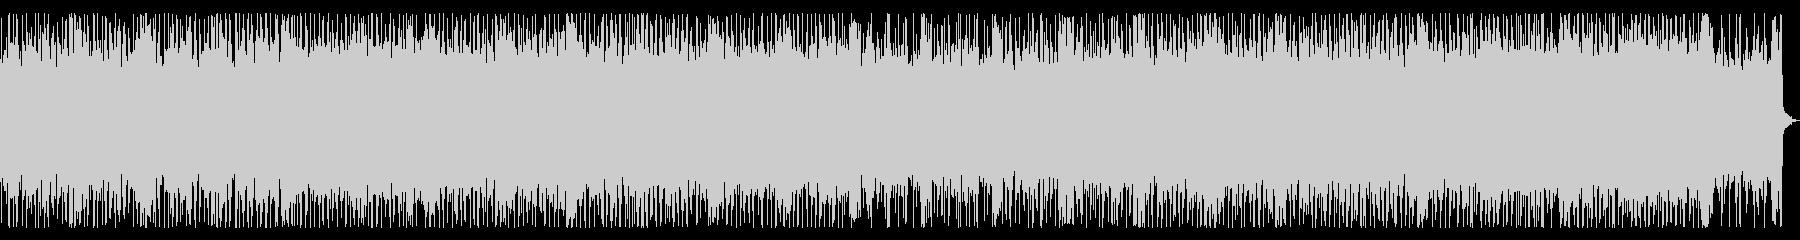 80s シンセポップ・レトロ・スケール感の未再生の波形